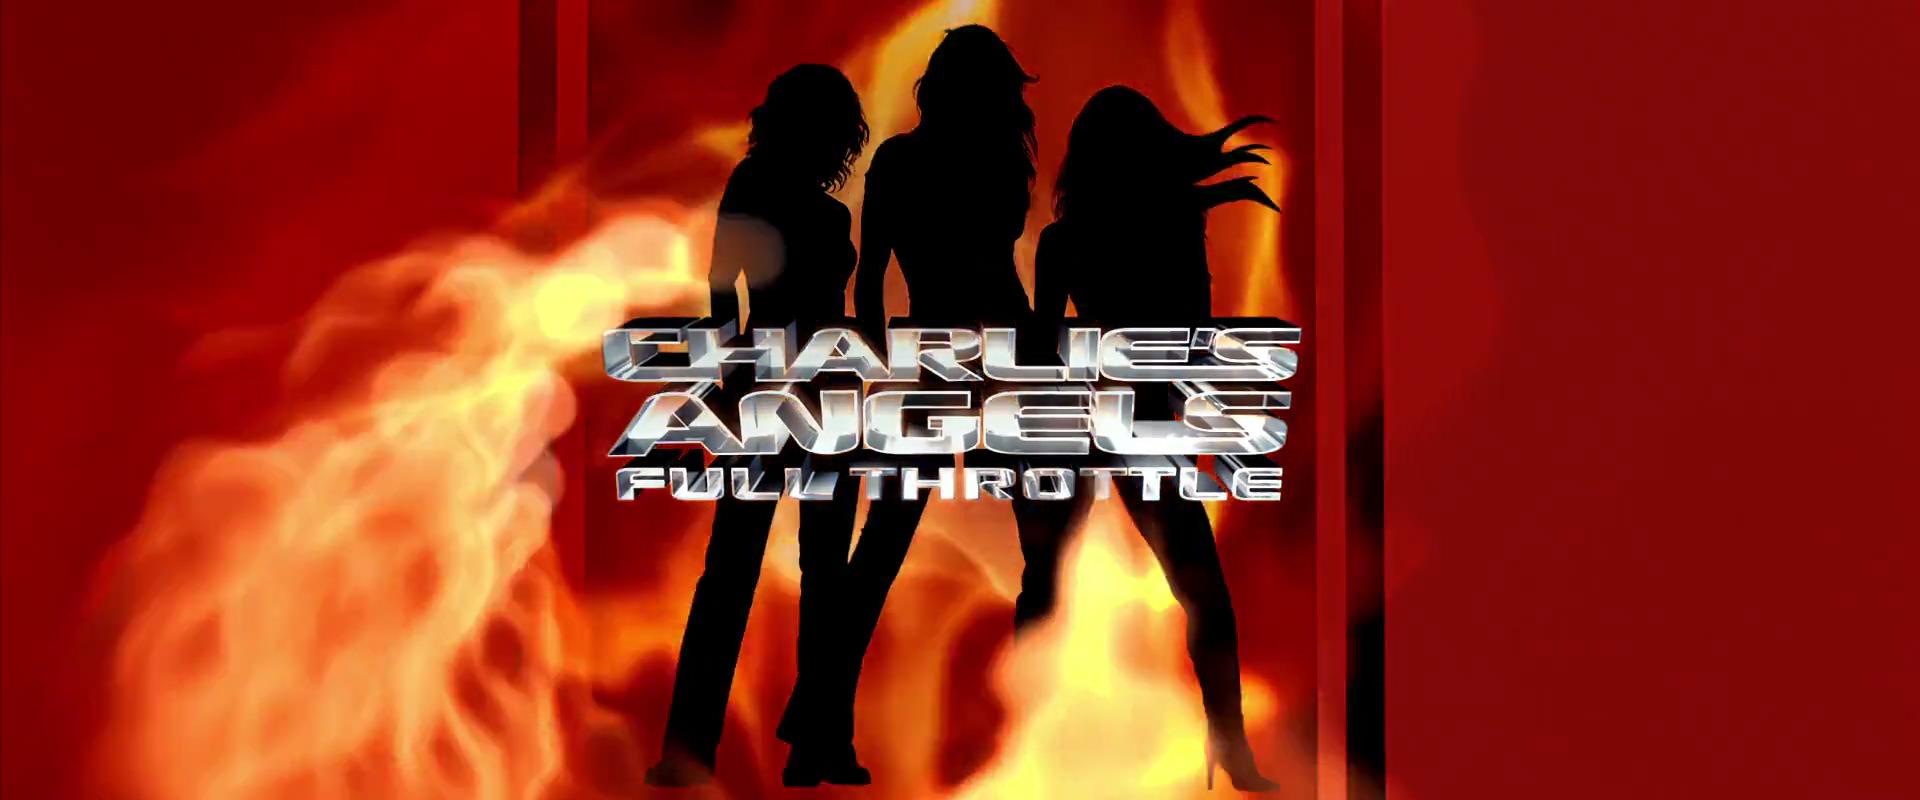 Charlie S Angels Full Throttle 2003 Movie Screencaps Com